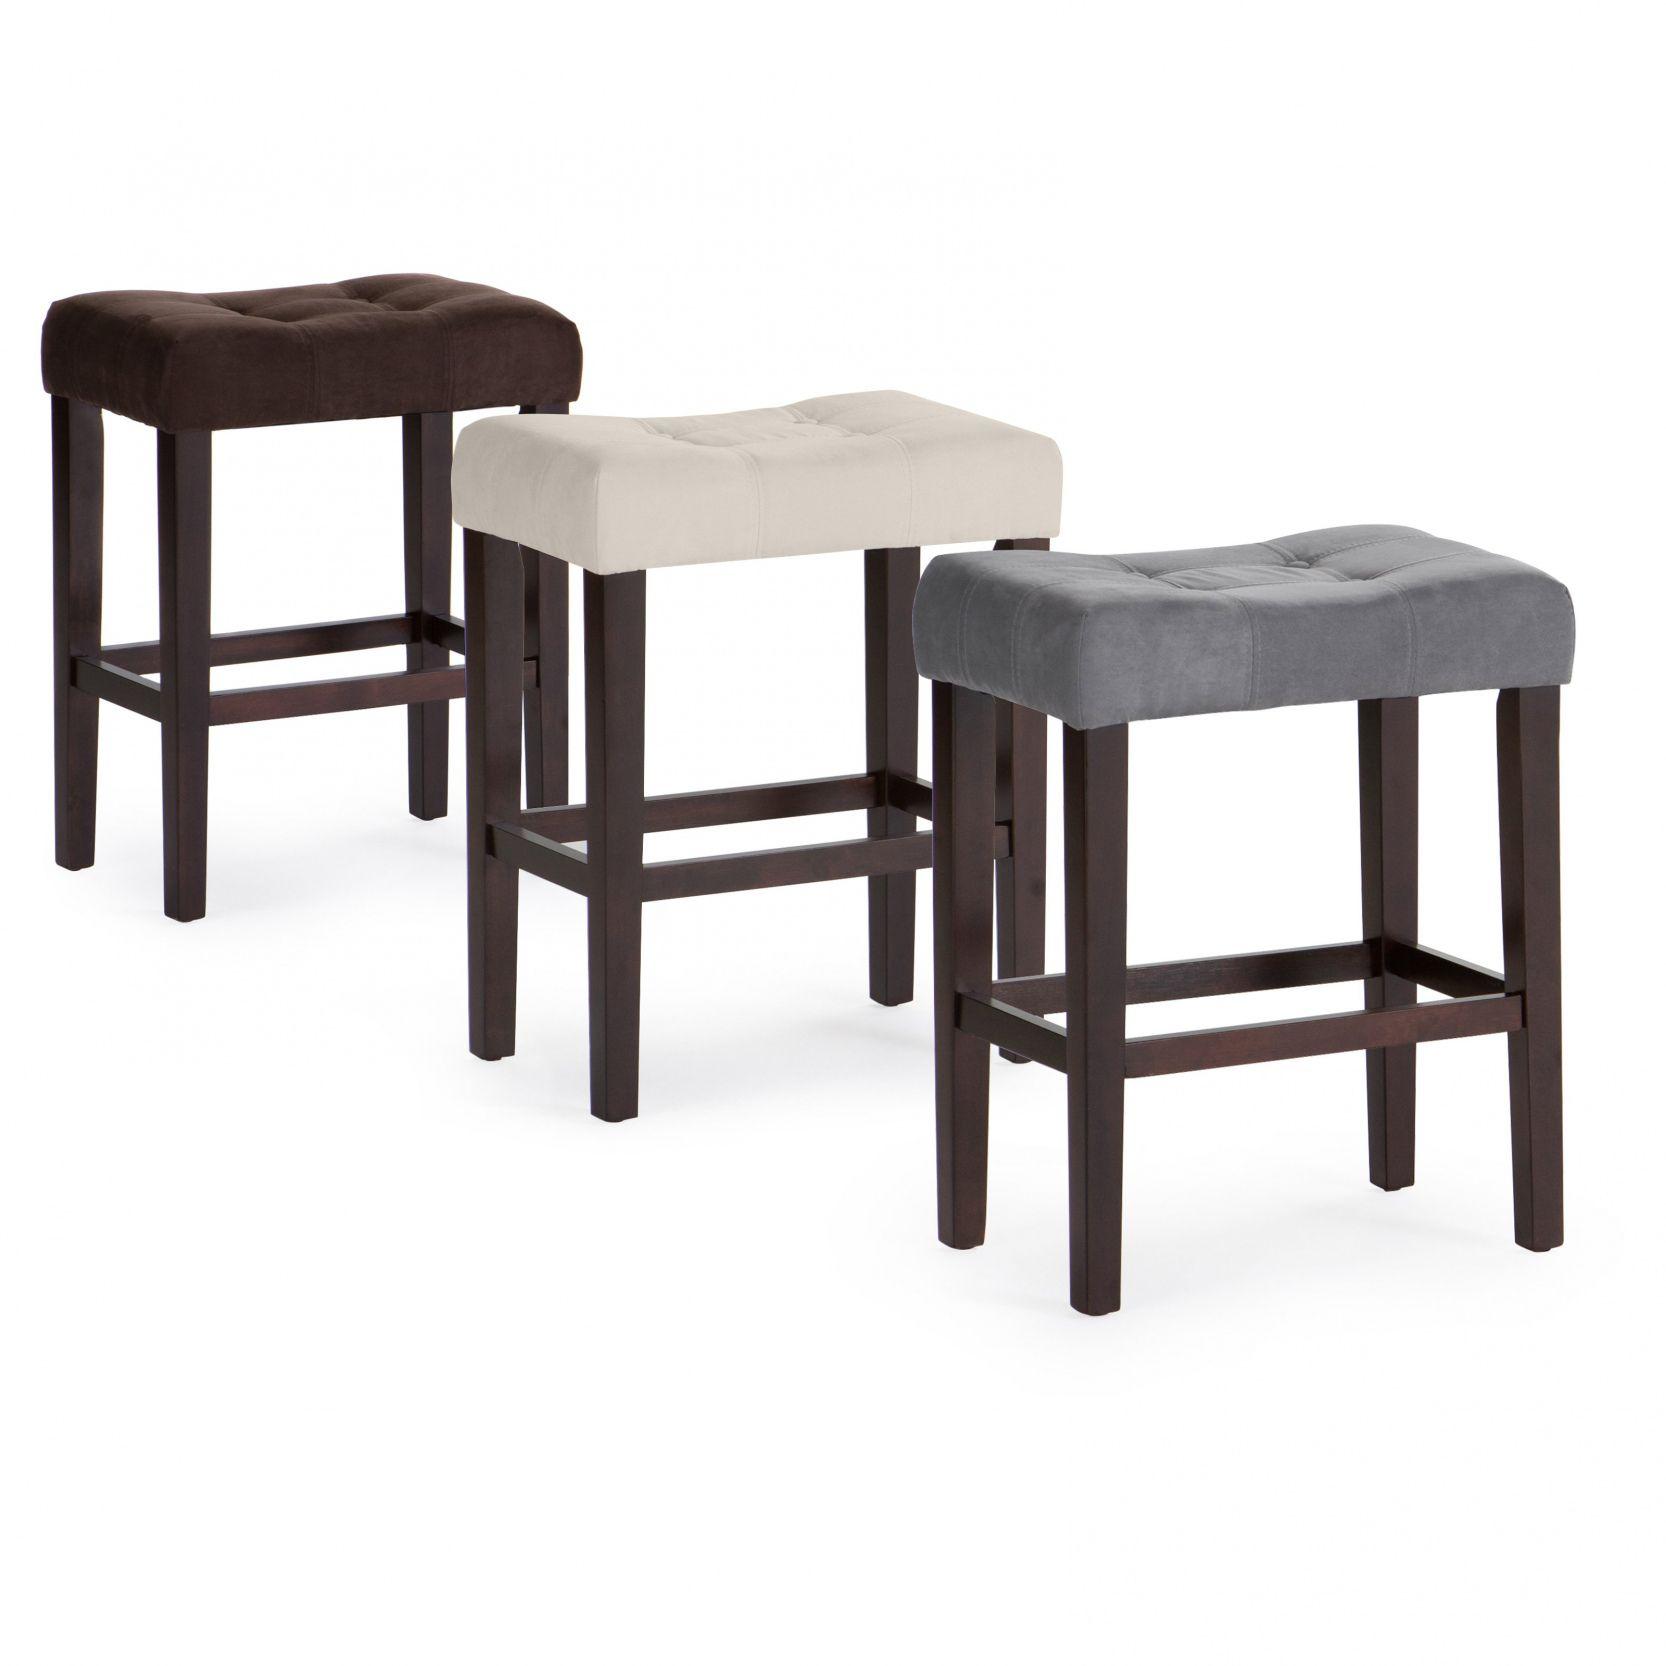 50 Bar Table & Stools Set Modern Design Furniture Check more at